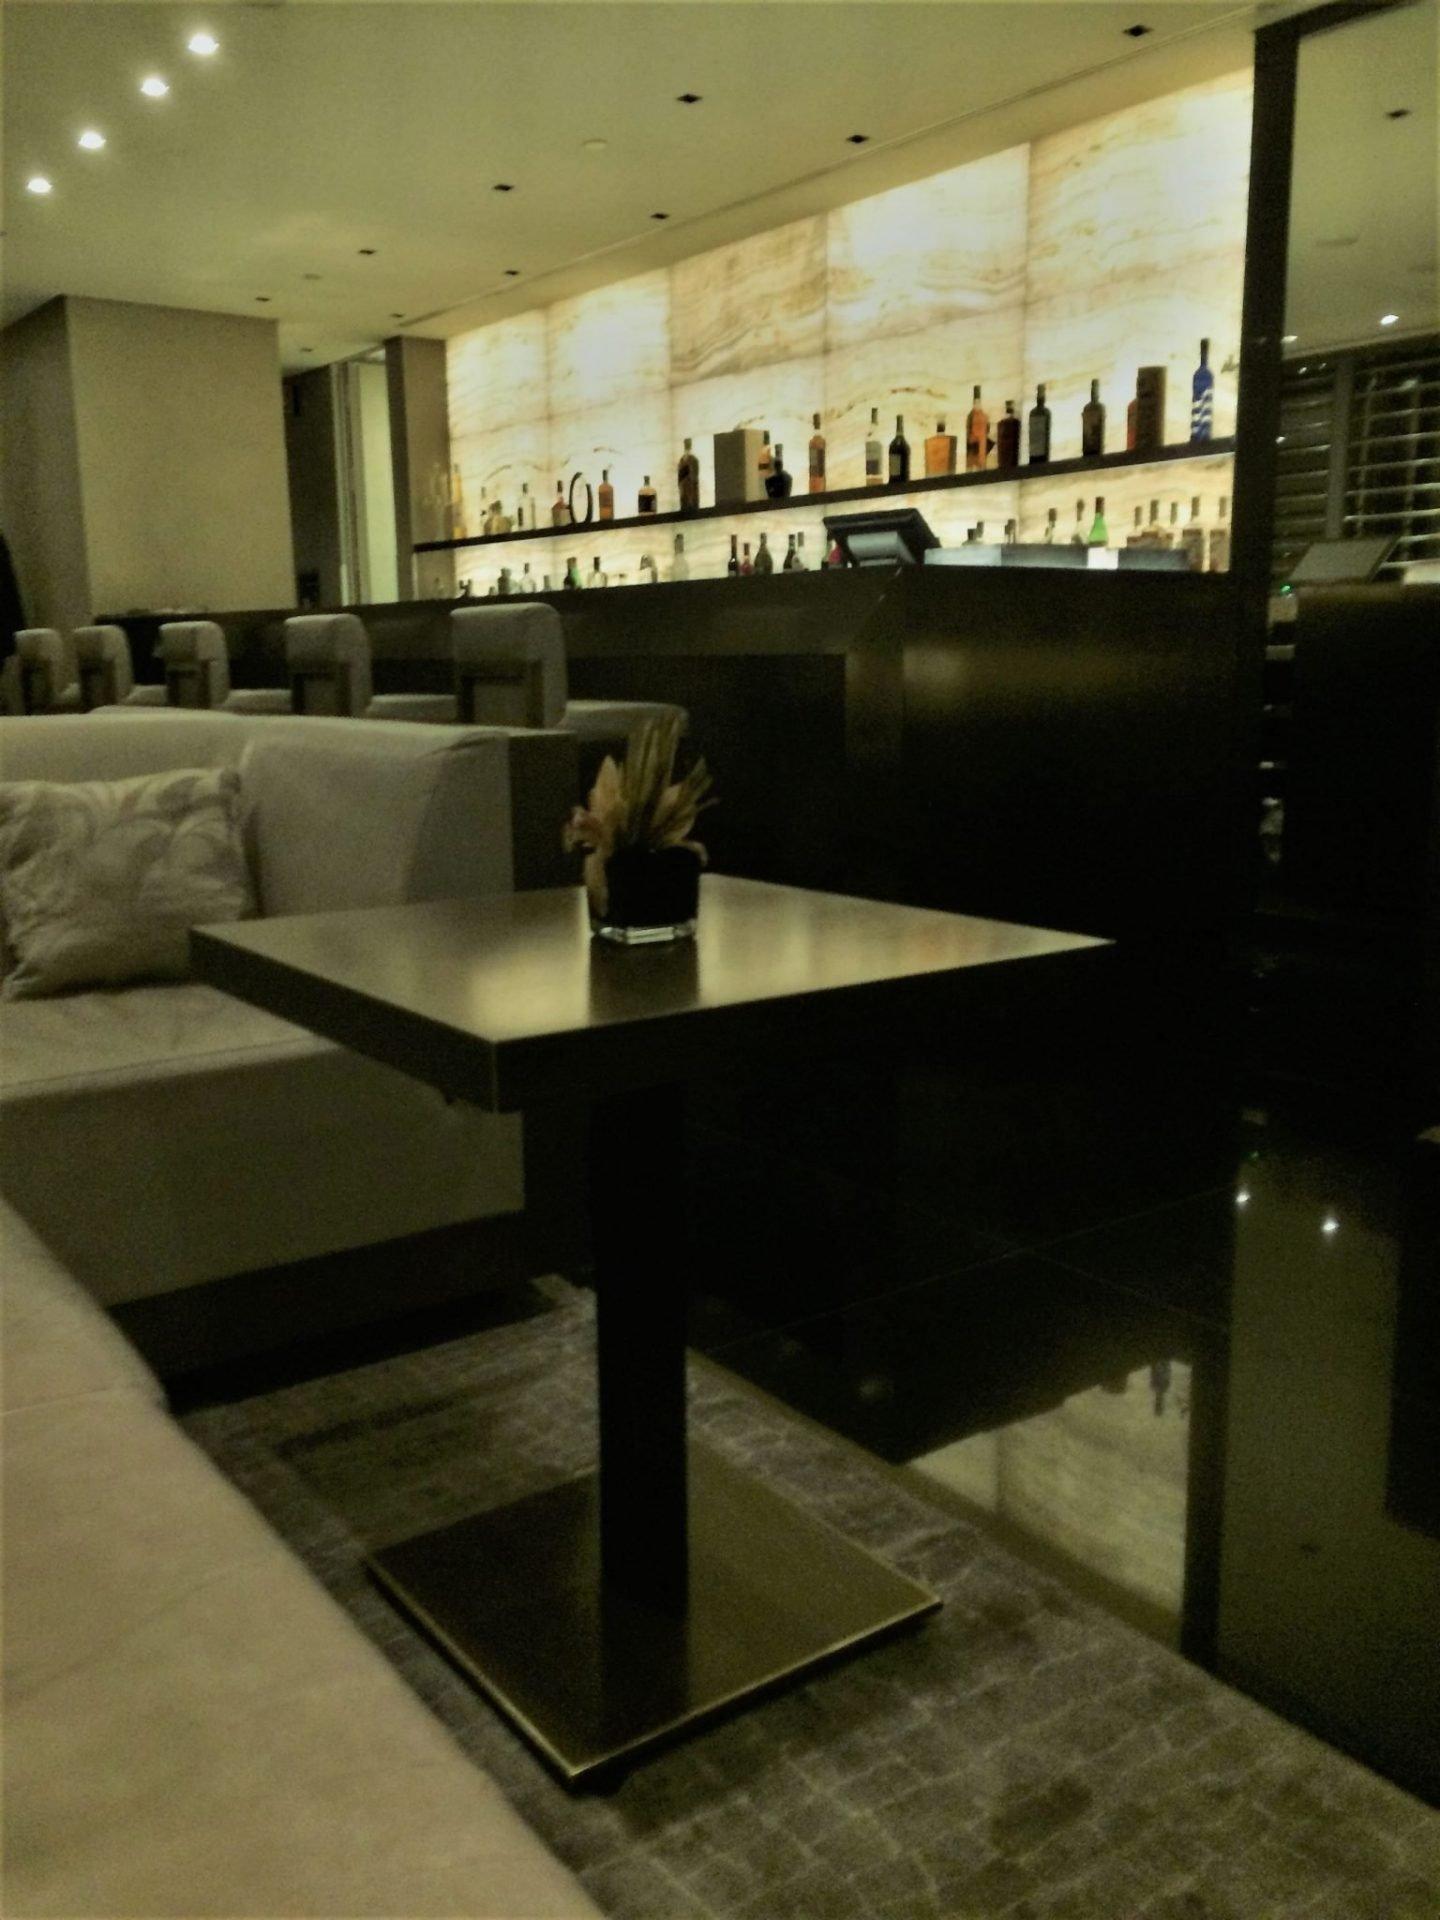 Armani Milan 2 1440x1920 - Armani Milan: a trendy drink